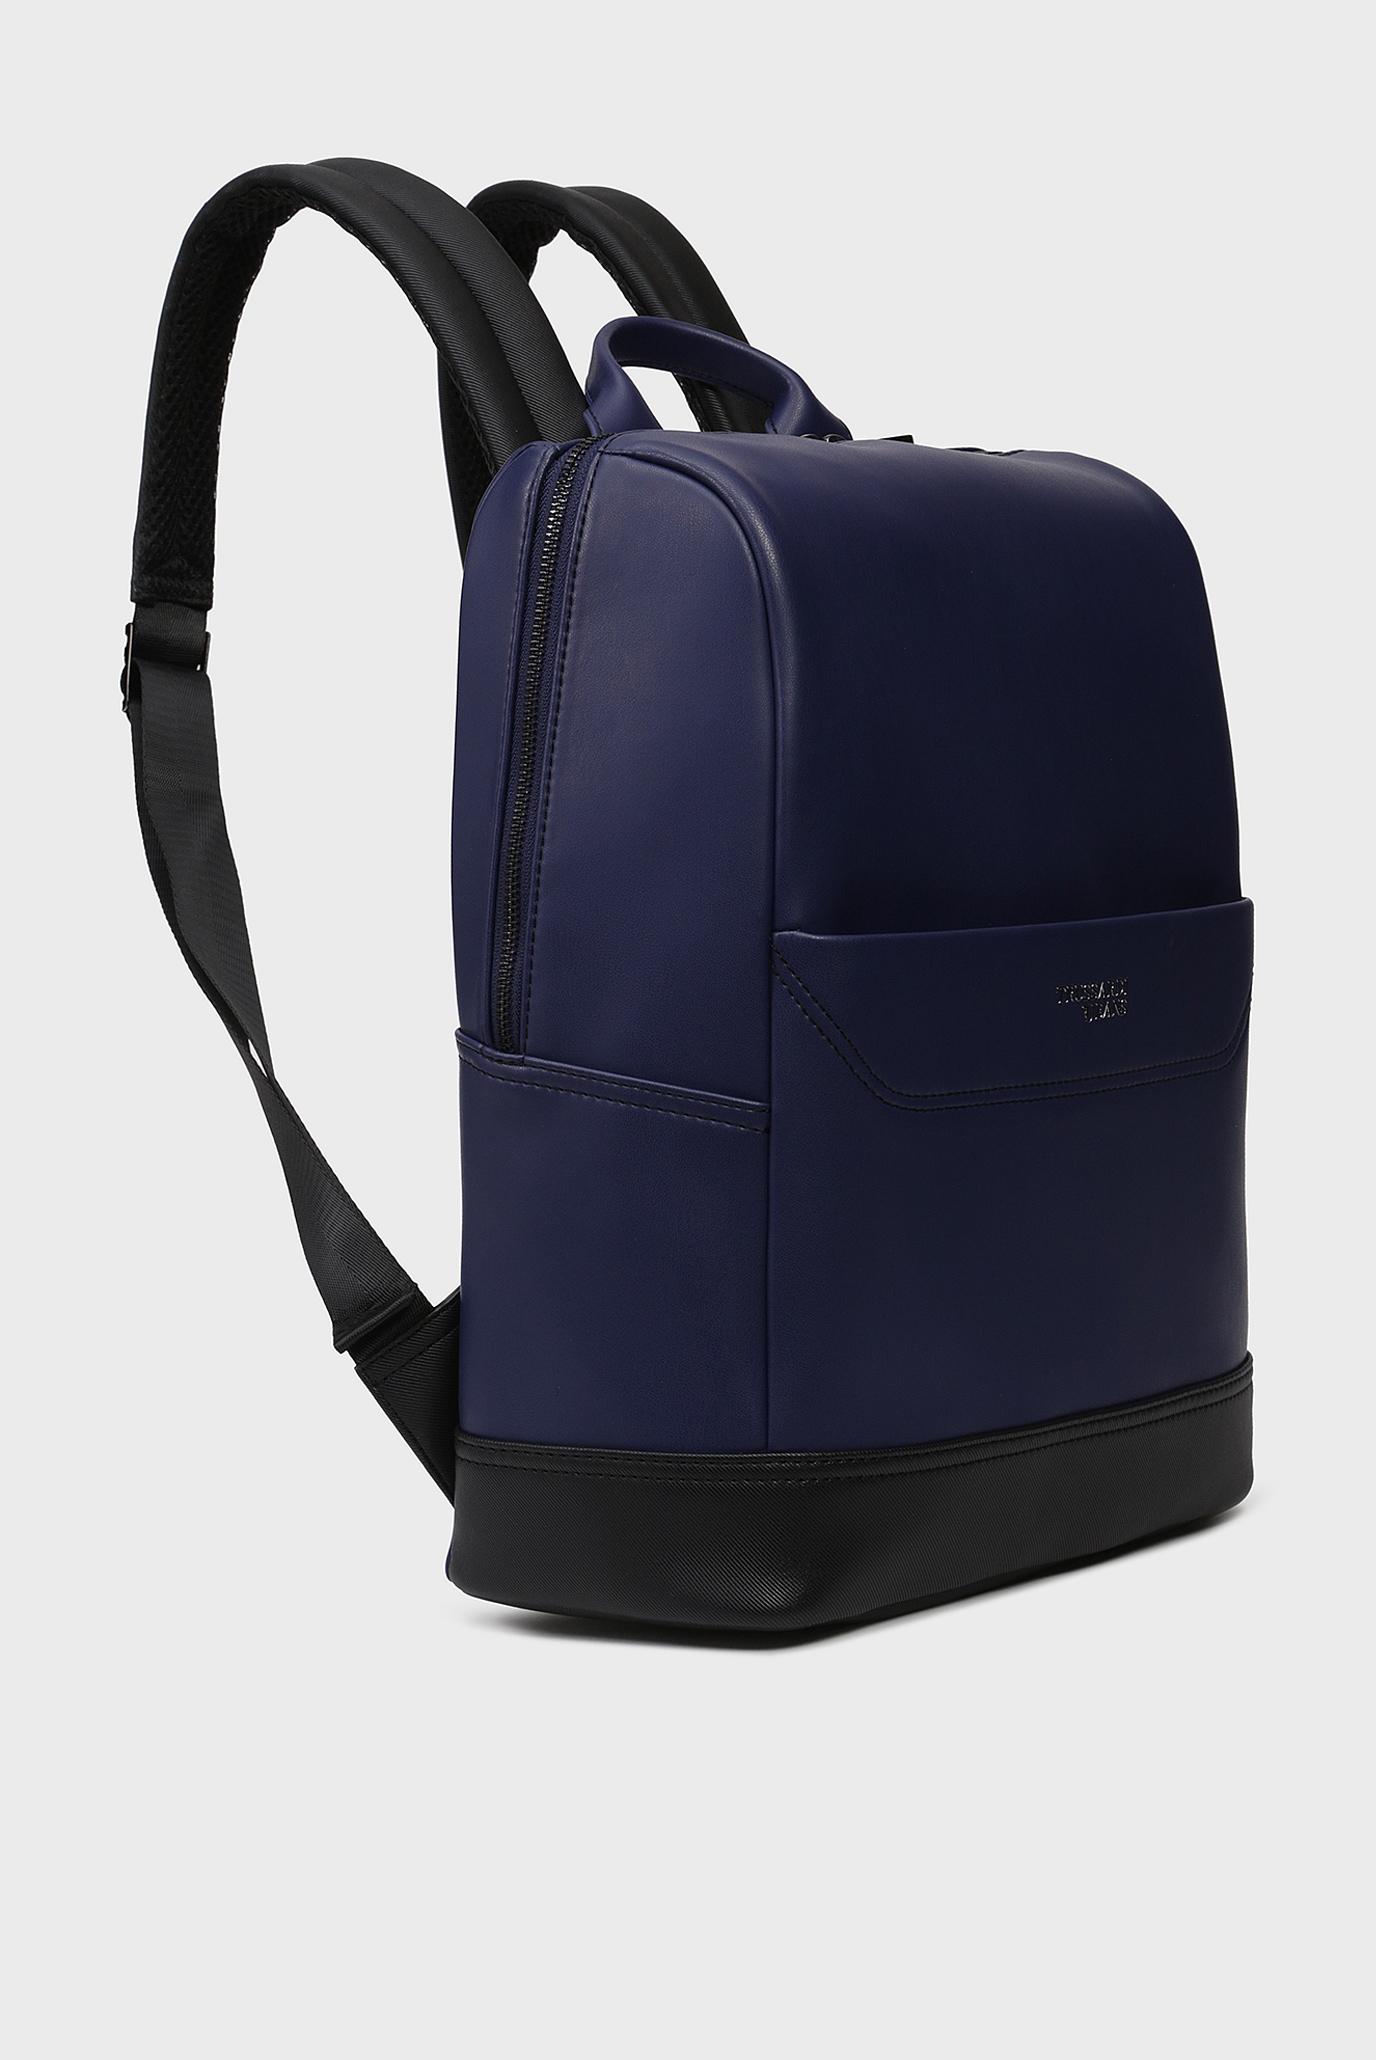 Мужской синий рюкзак BUSINESS CITY  Trussardi Jeans